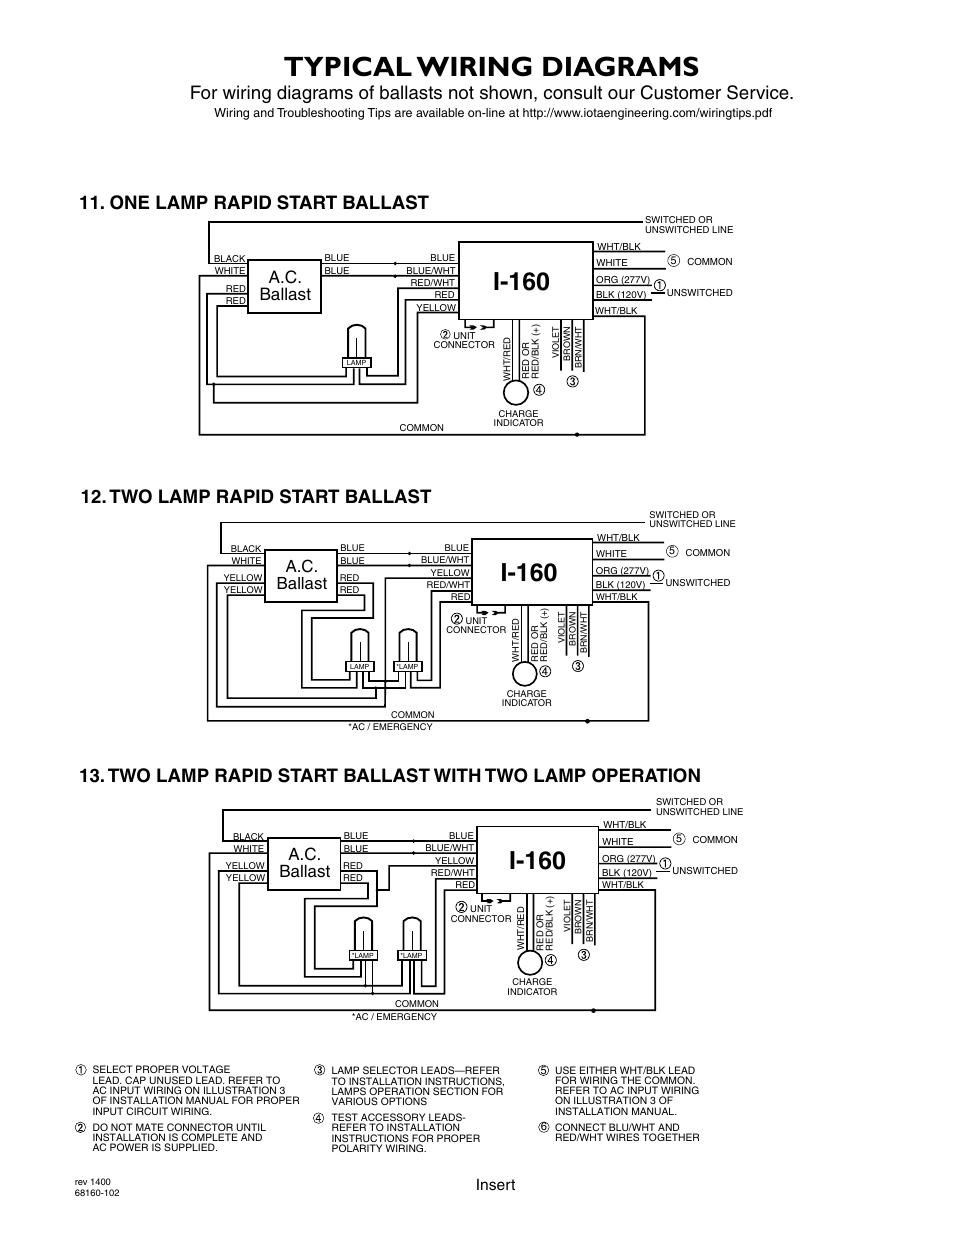 Iota I 320 Wiring Diagram